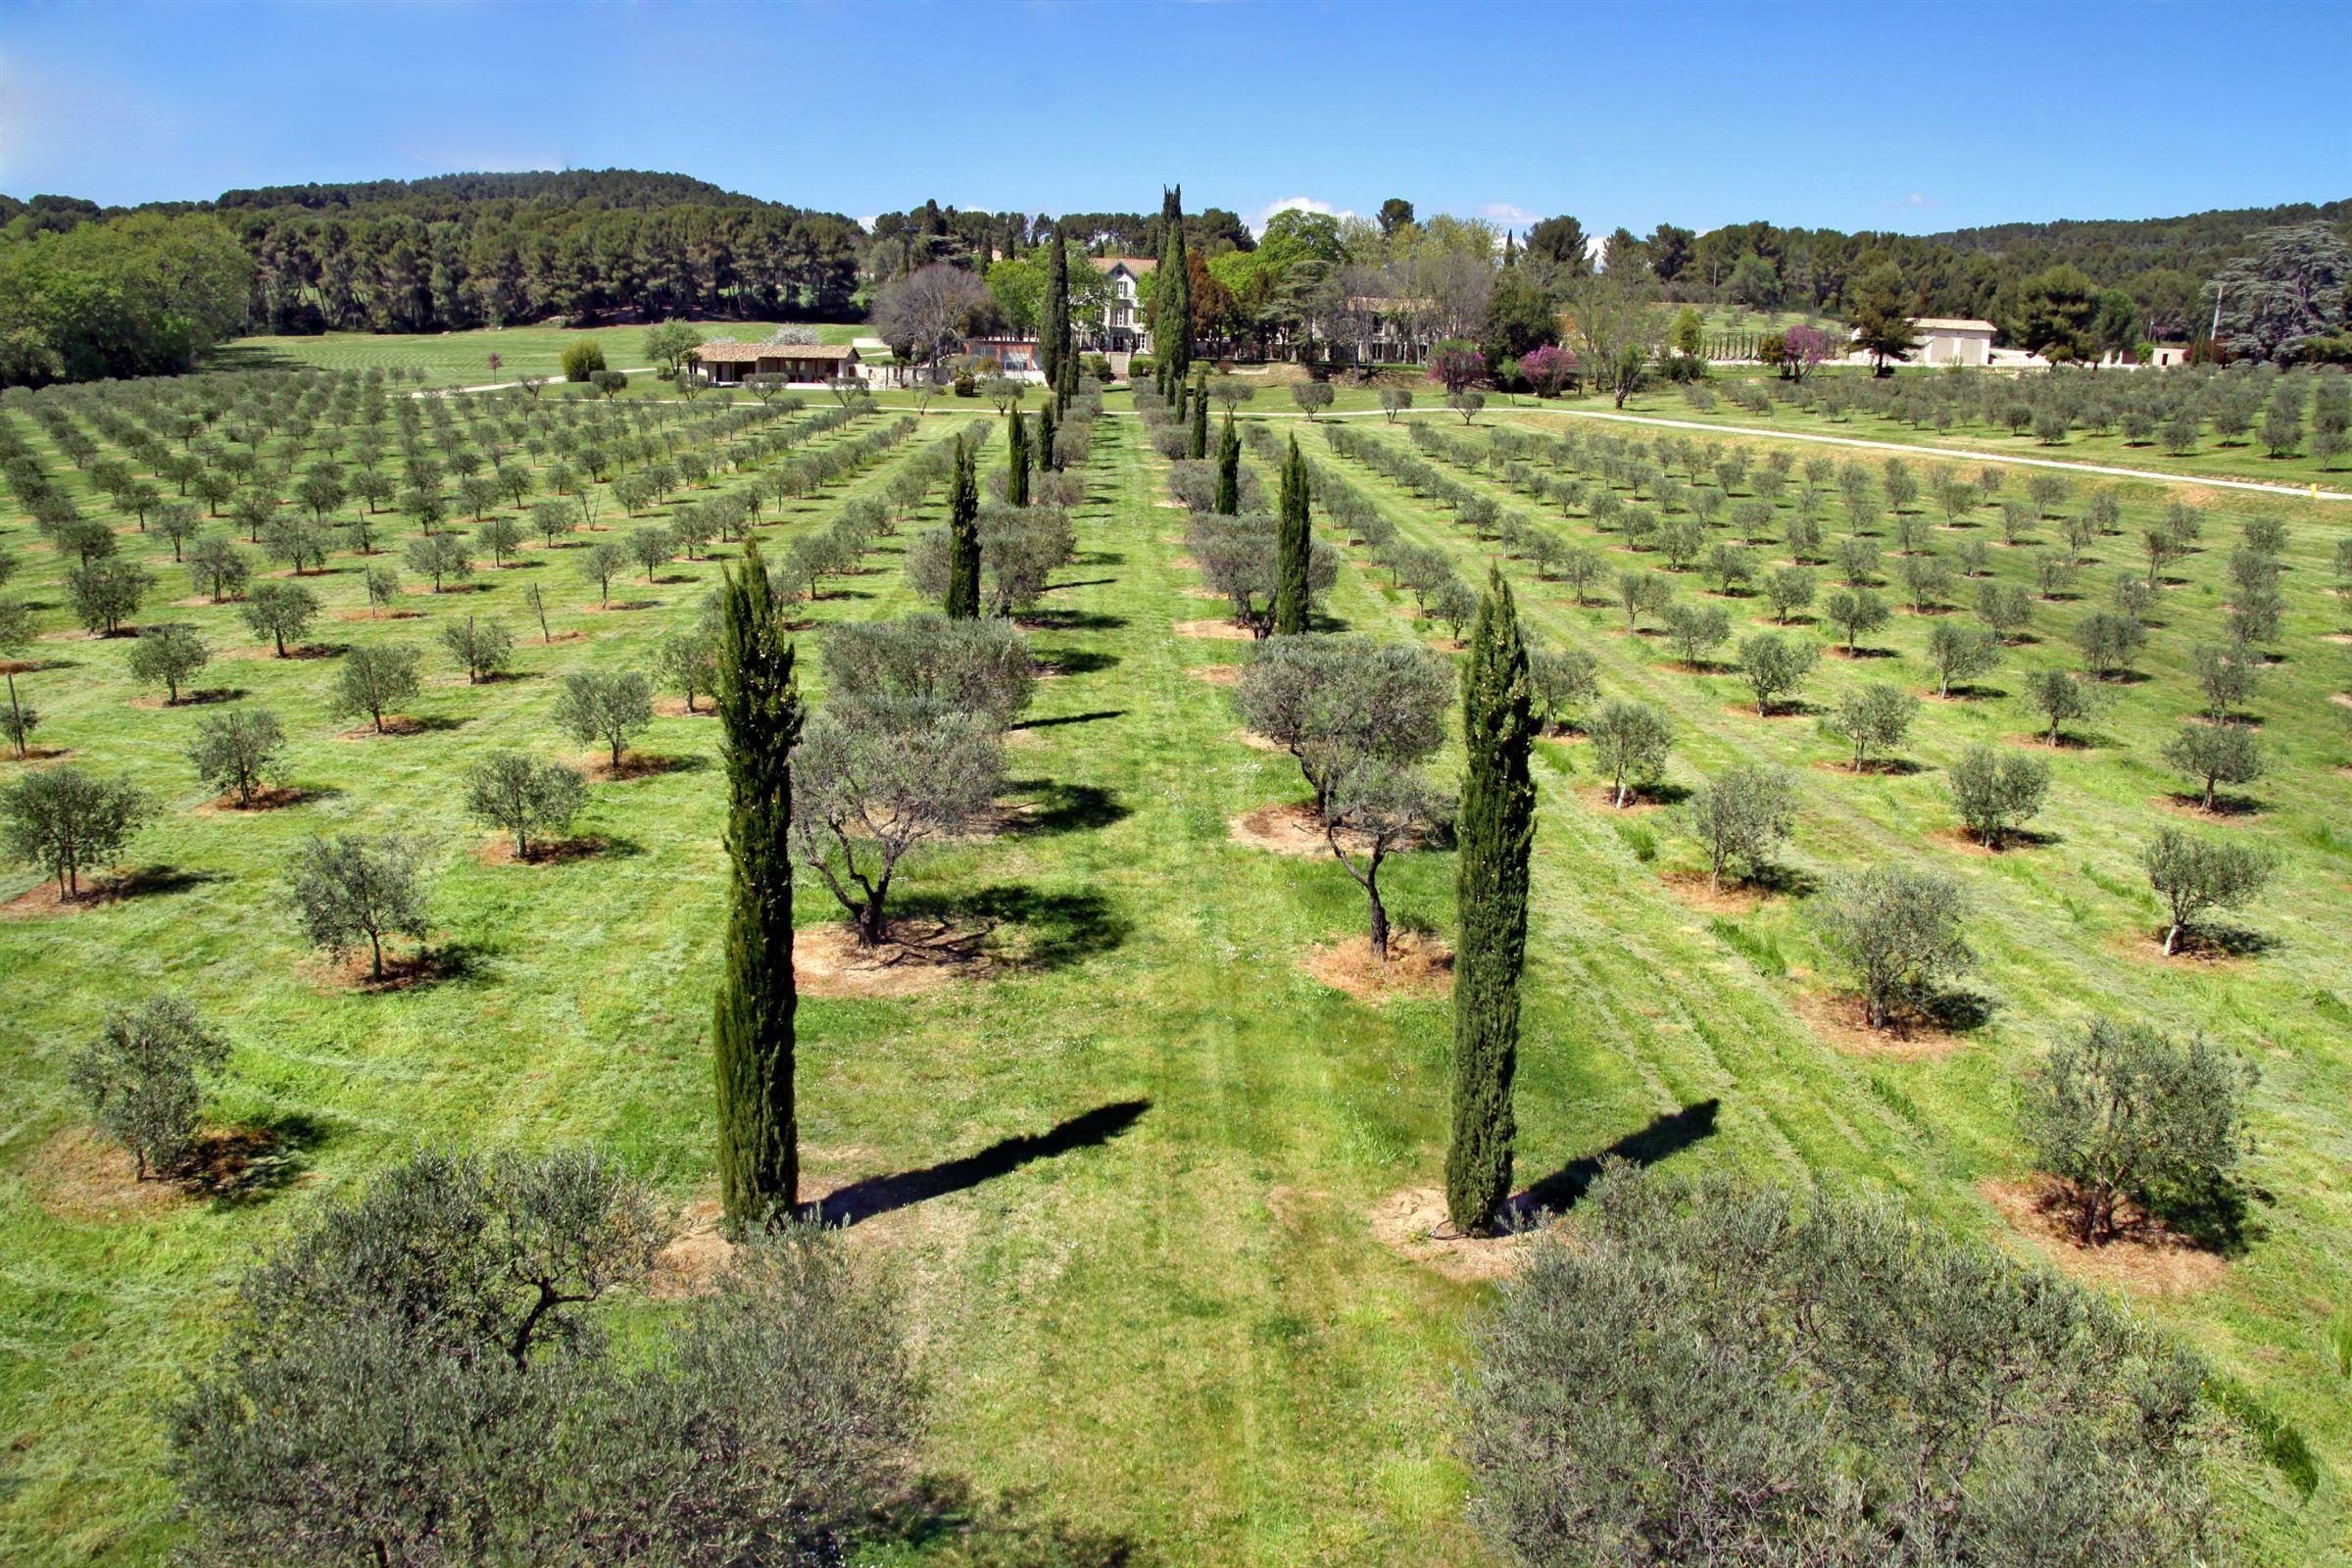 Property For Sale at Aix en Provence - 25 acres